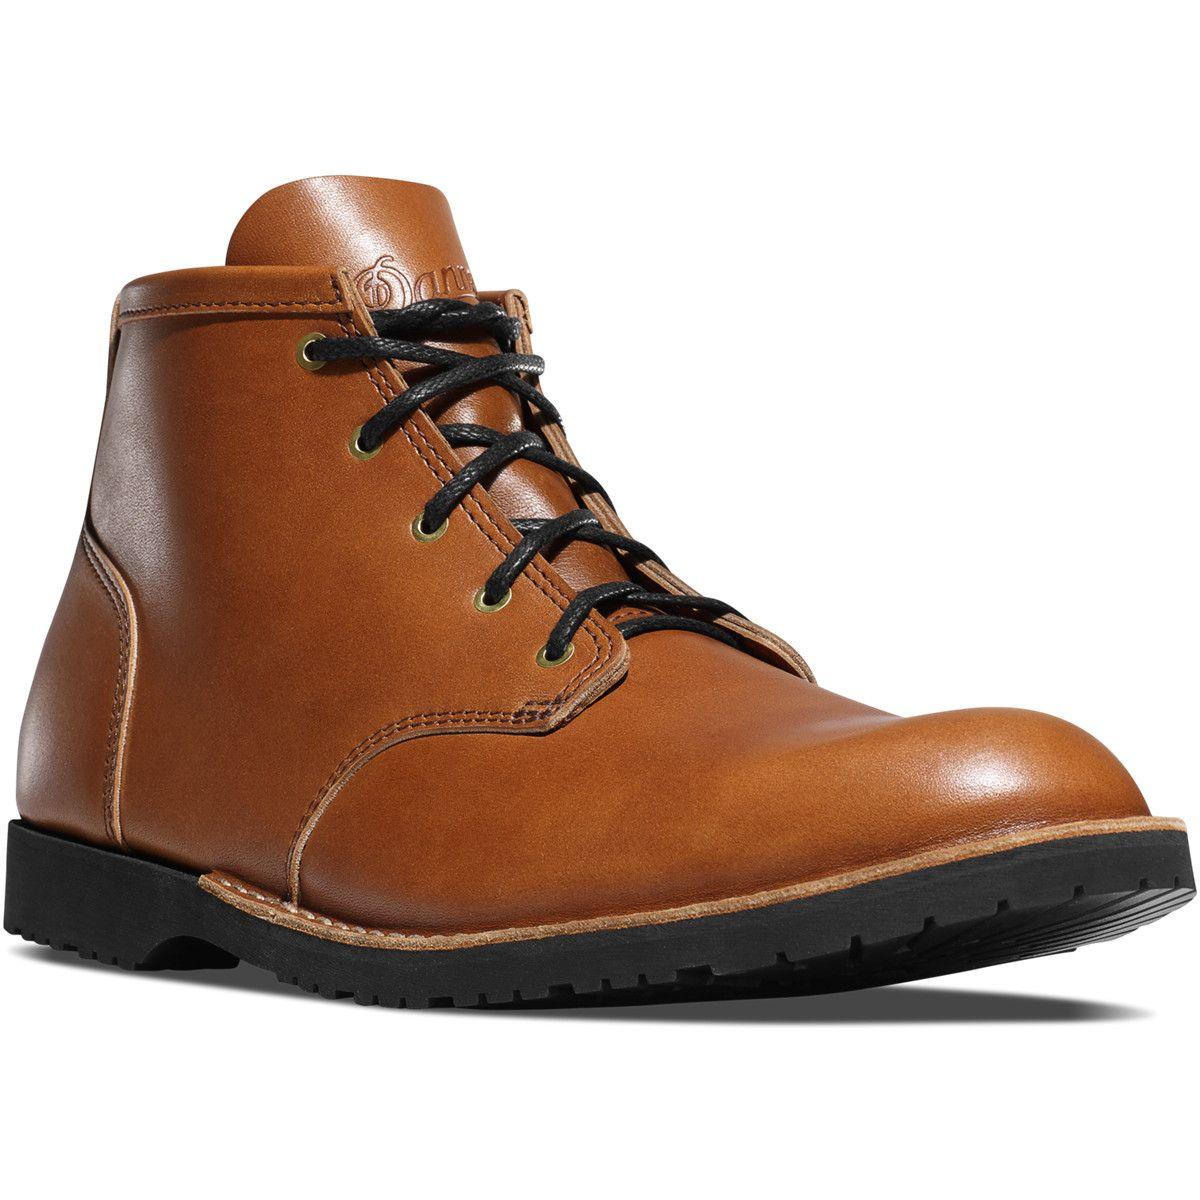 1000  images about Shoes on Pinterest   Vivobarefoot shoes Men&39s